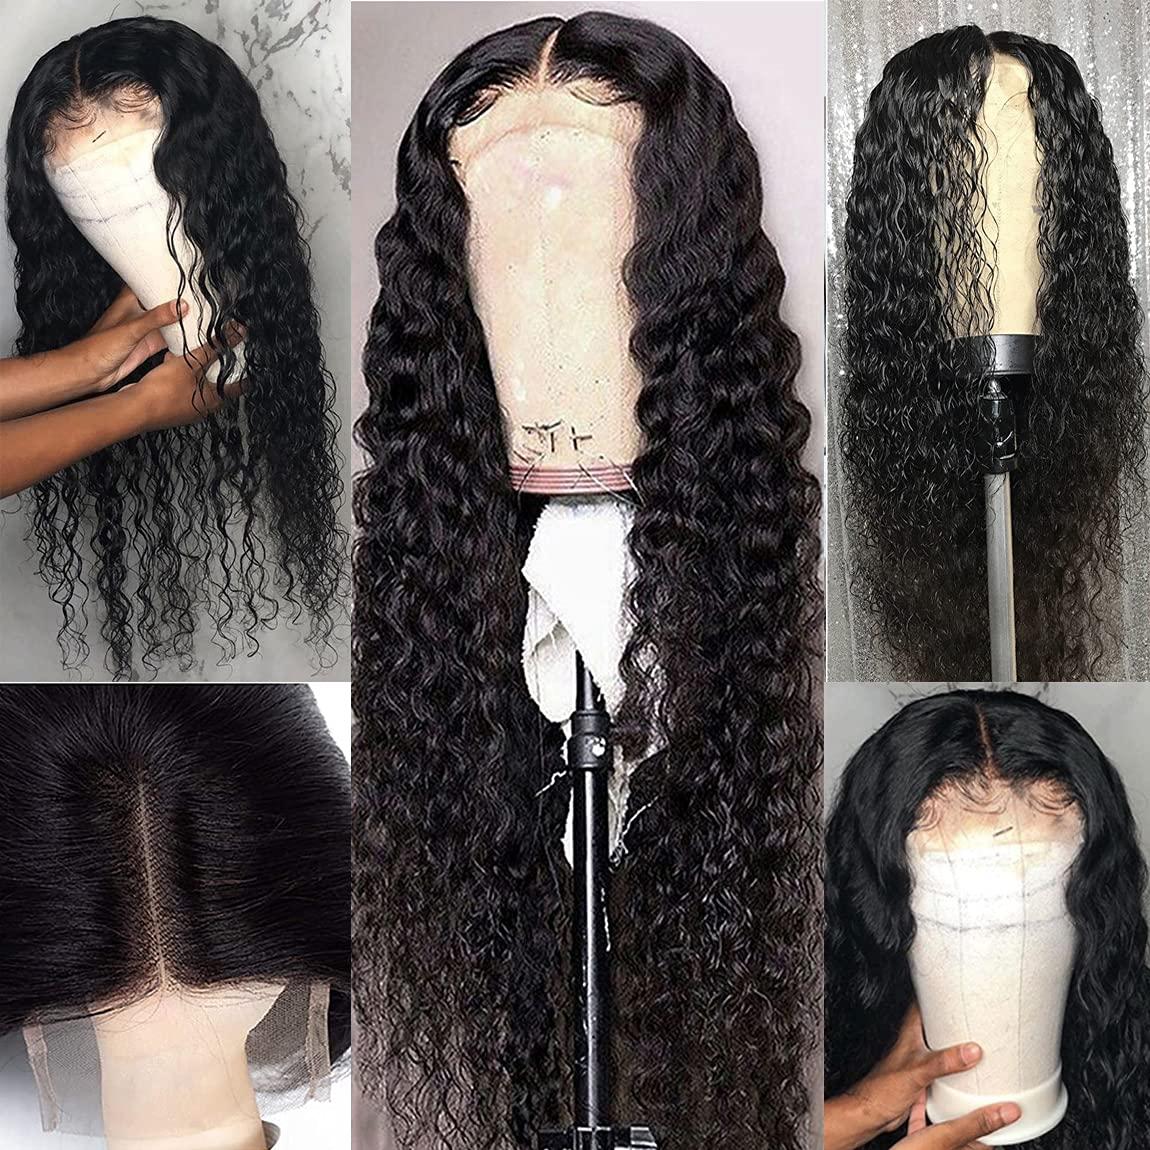 Arabella Japan Max 40% OFF Maker New Lace Front Wigs Human Deep Hair 10a 4x4